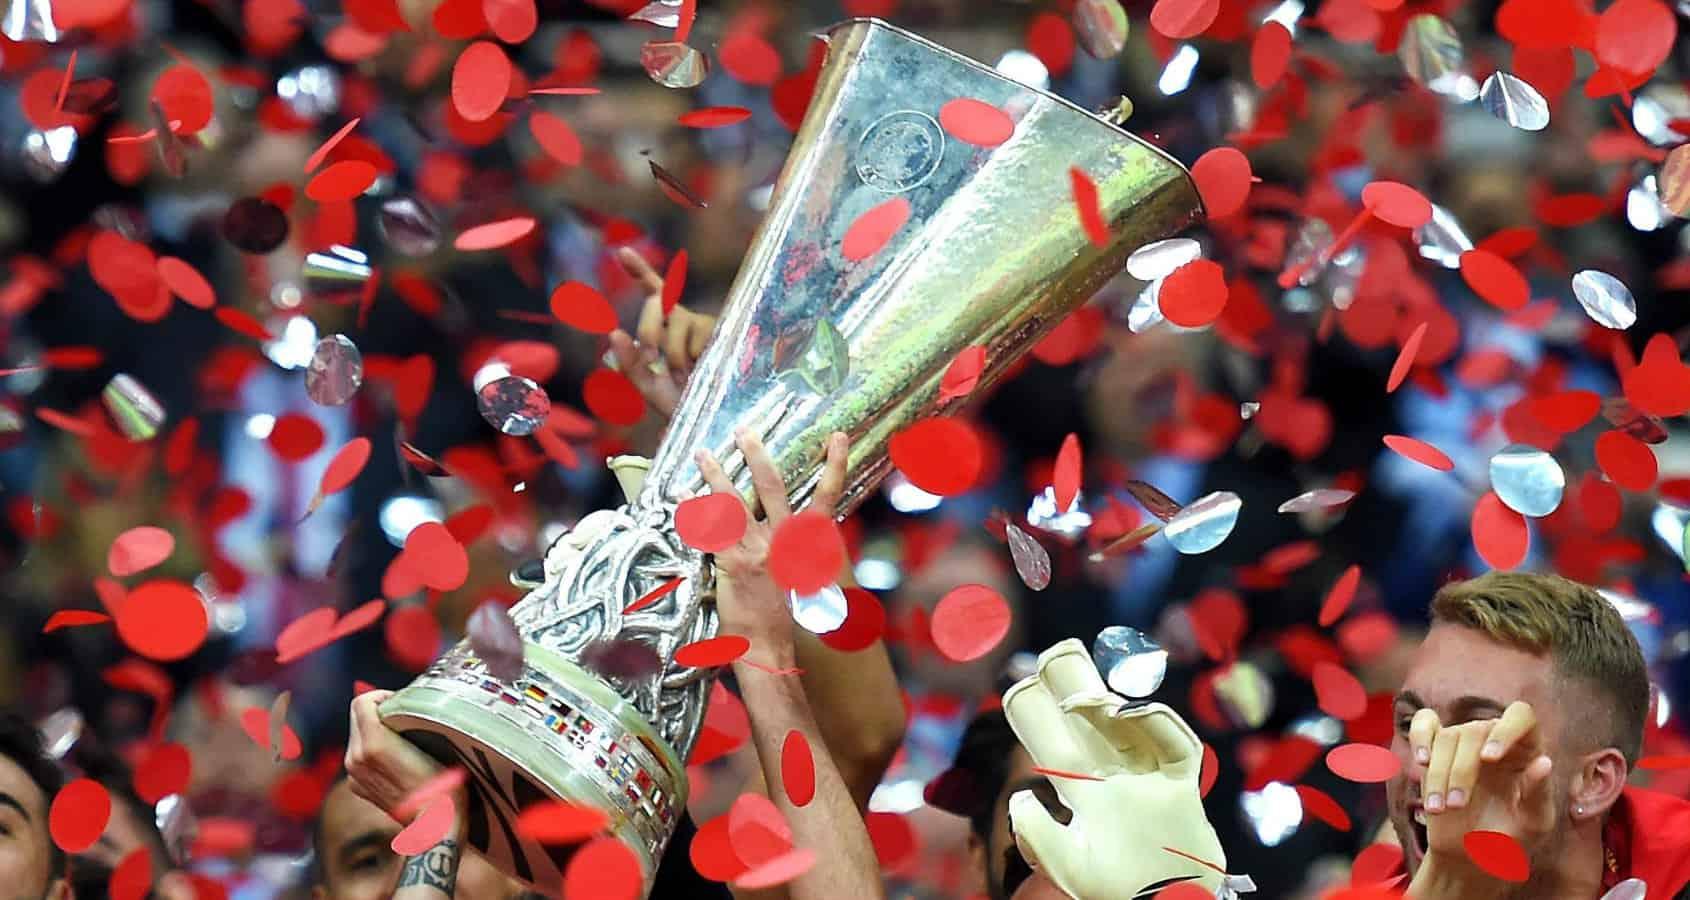 Europa League, Fotbollsresa